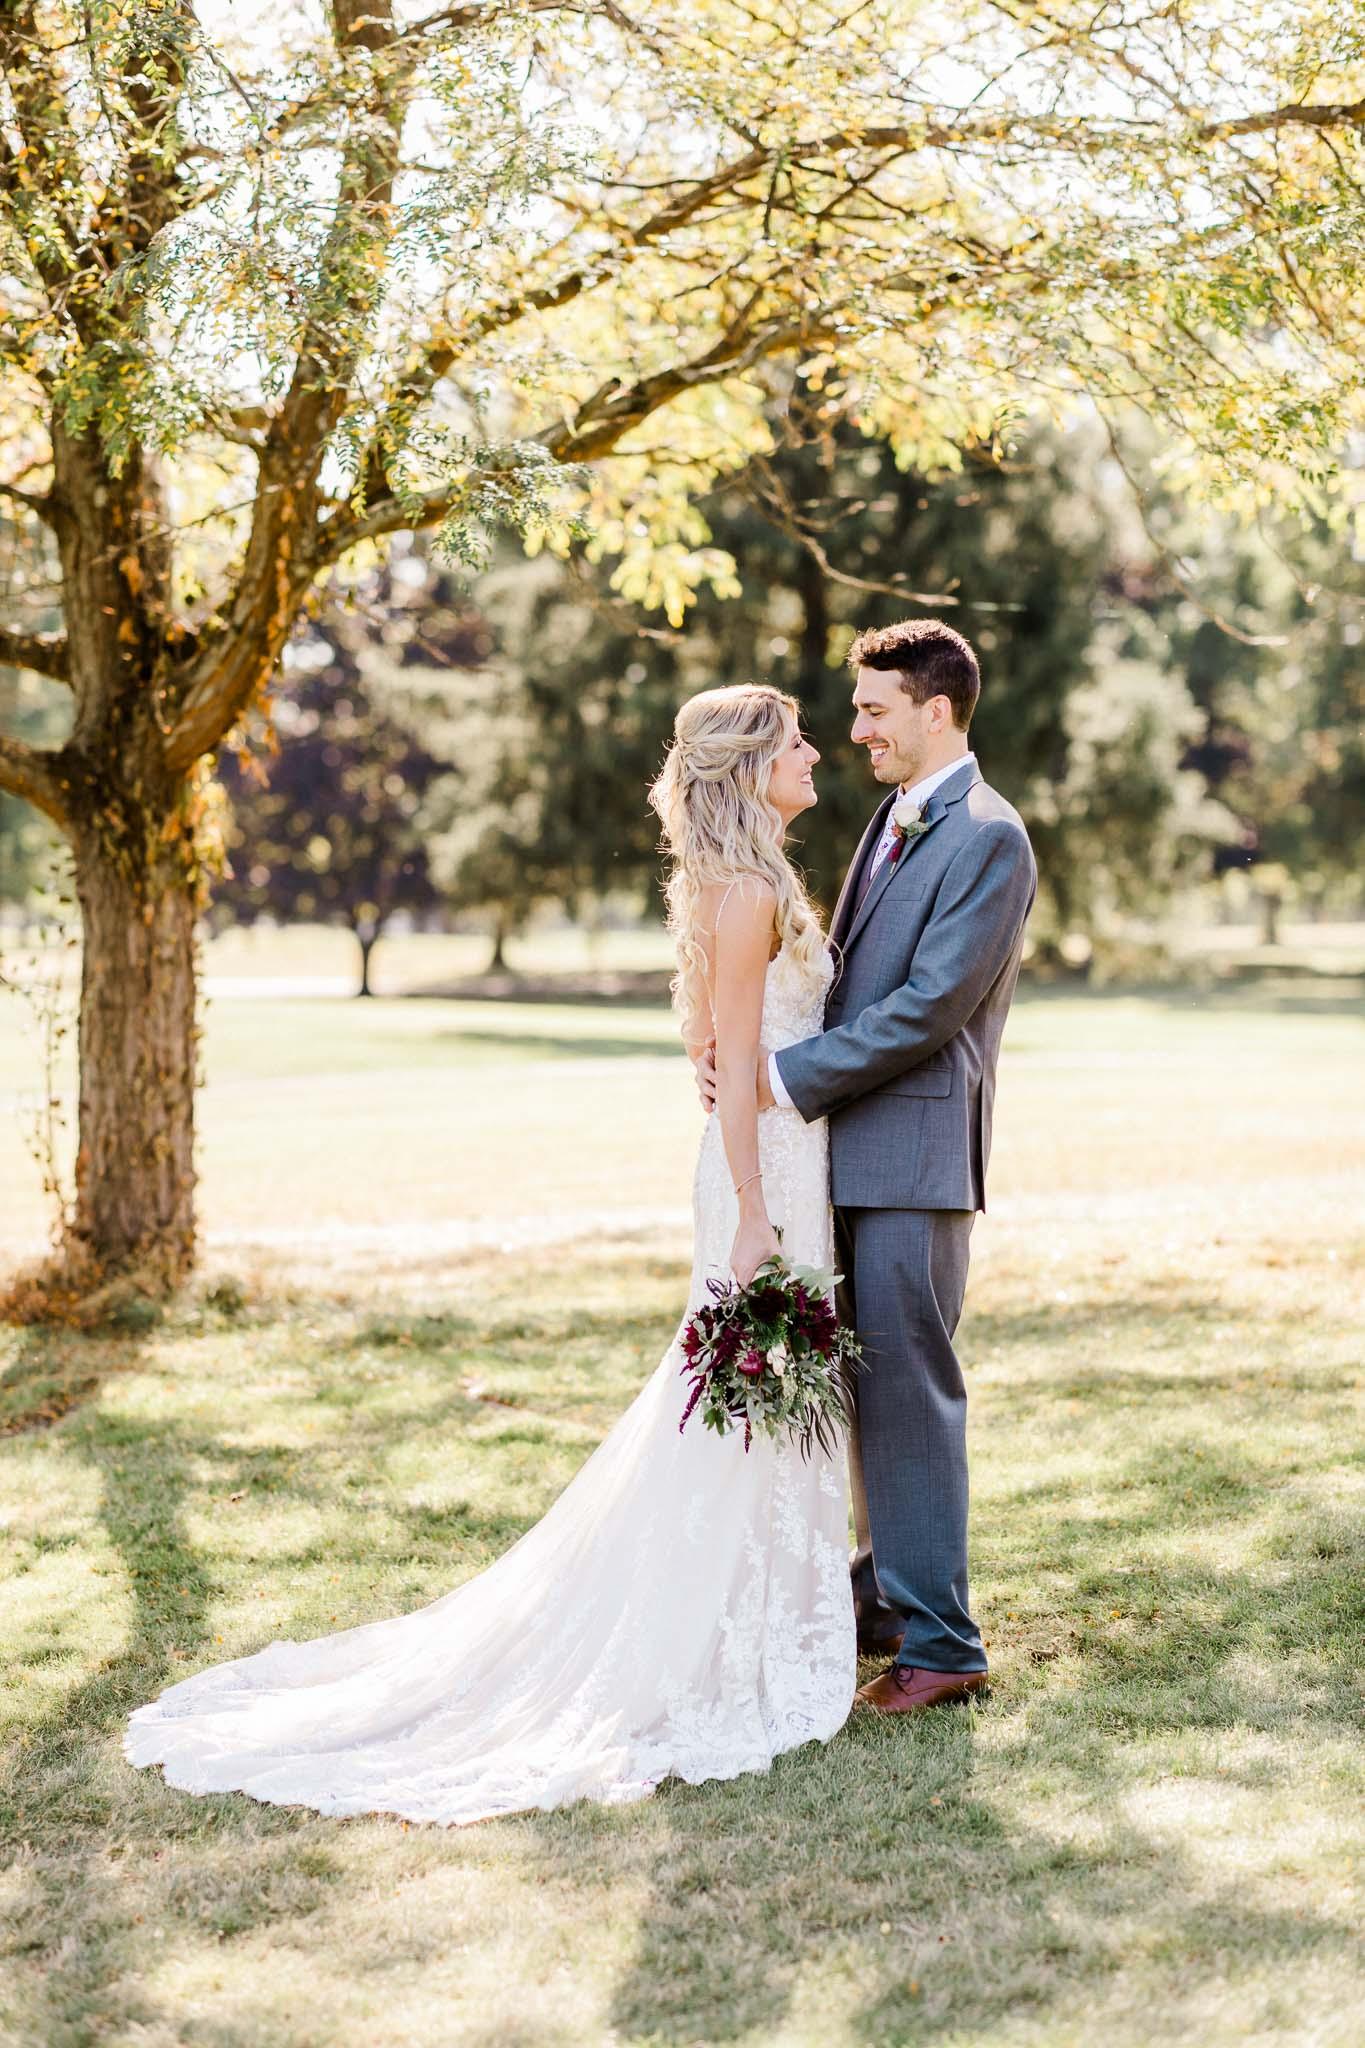 Frosty-Valley-September-Wedding-7465.jpg